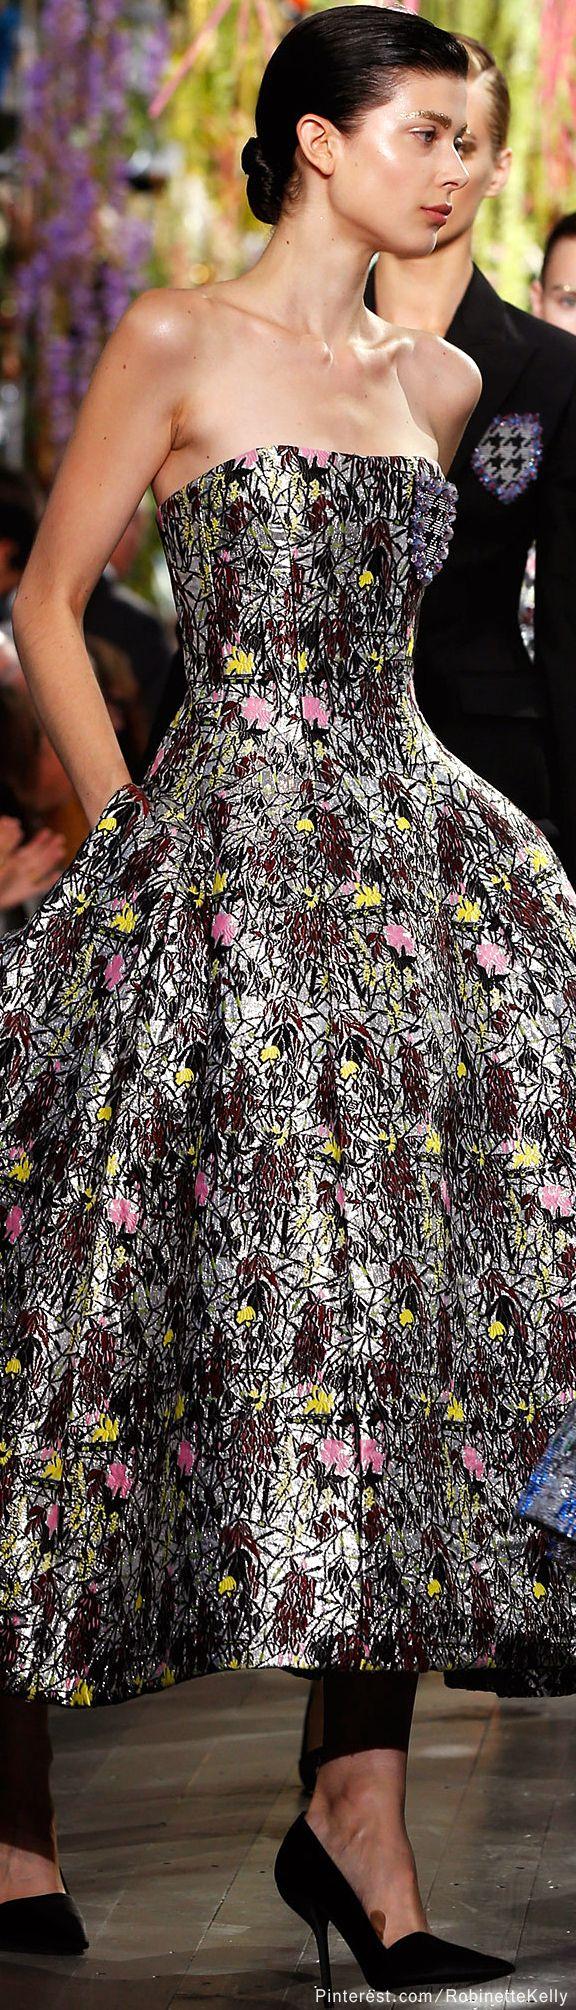 Christian Dior   S/S 2014  XXXXXXXXXXXXXXXXXXXXXXXXXXXXXXXXXXXXXXXXXXXXXXXXXXXXXXXXXXXXXXXXXXXXXXXXXXXXXXXXXXXXXXXXXXXXXXXXXXXXXXXXXXXXX